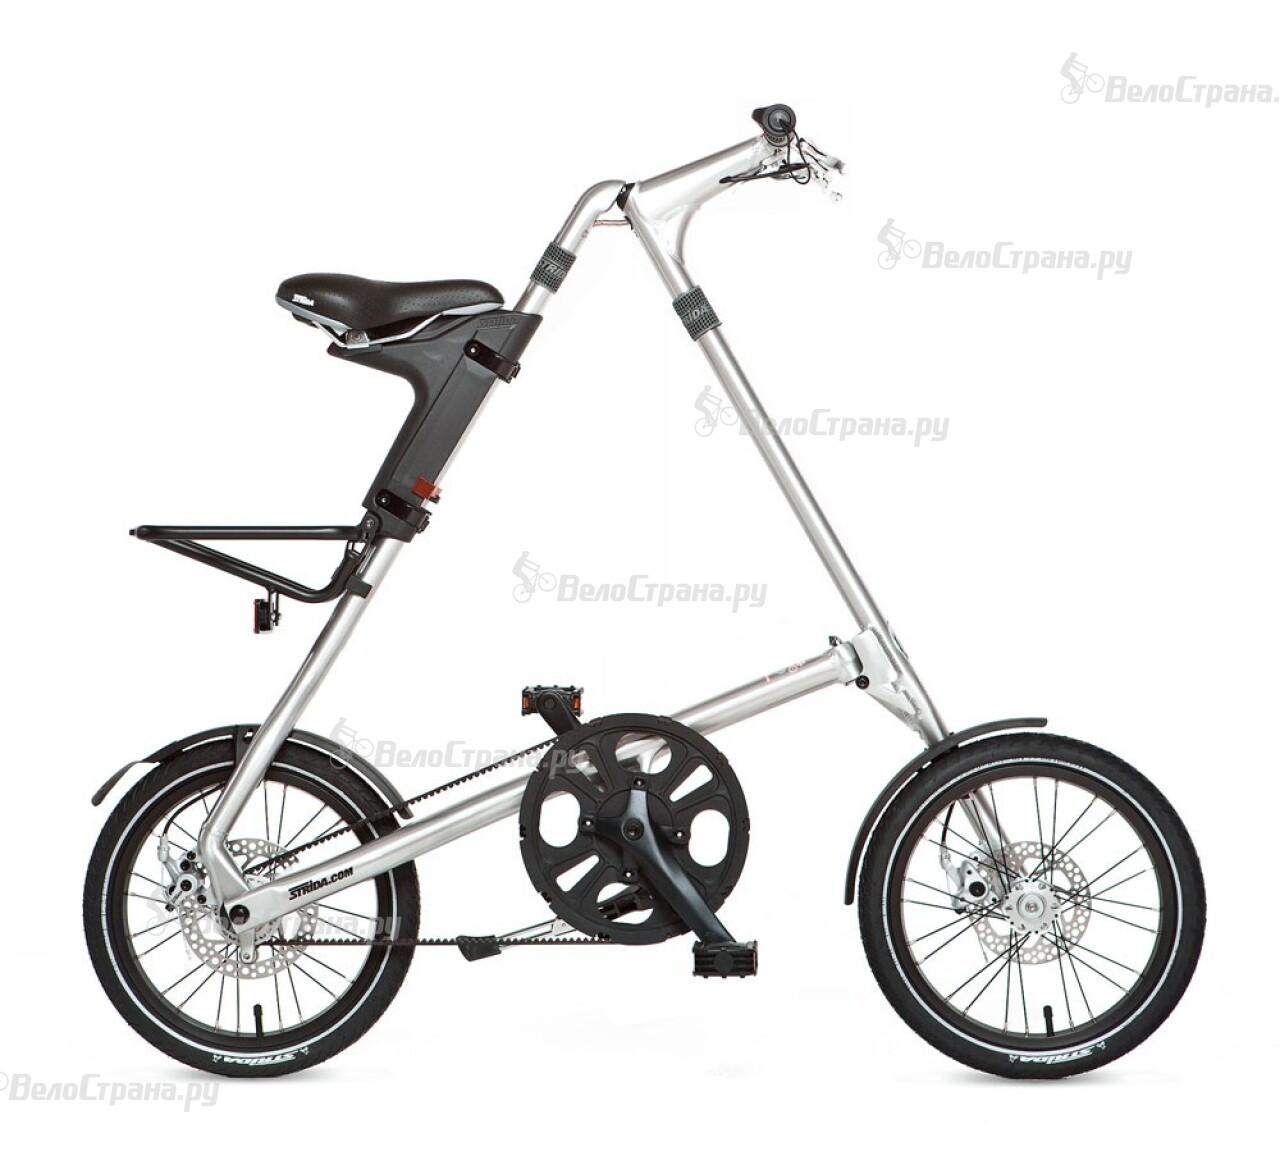 Велосипед Strida 5.2 (2013)